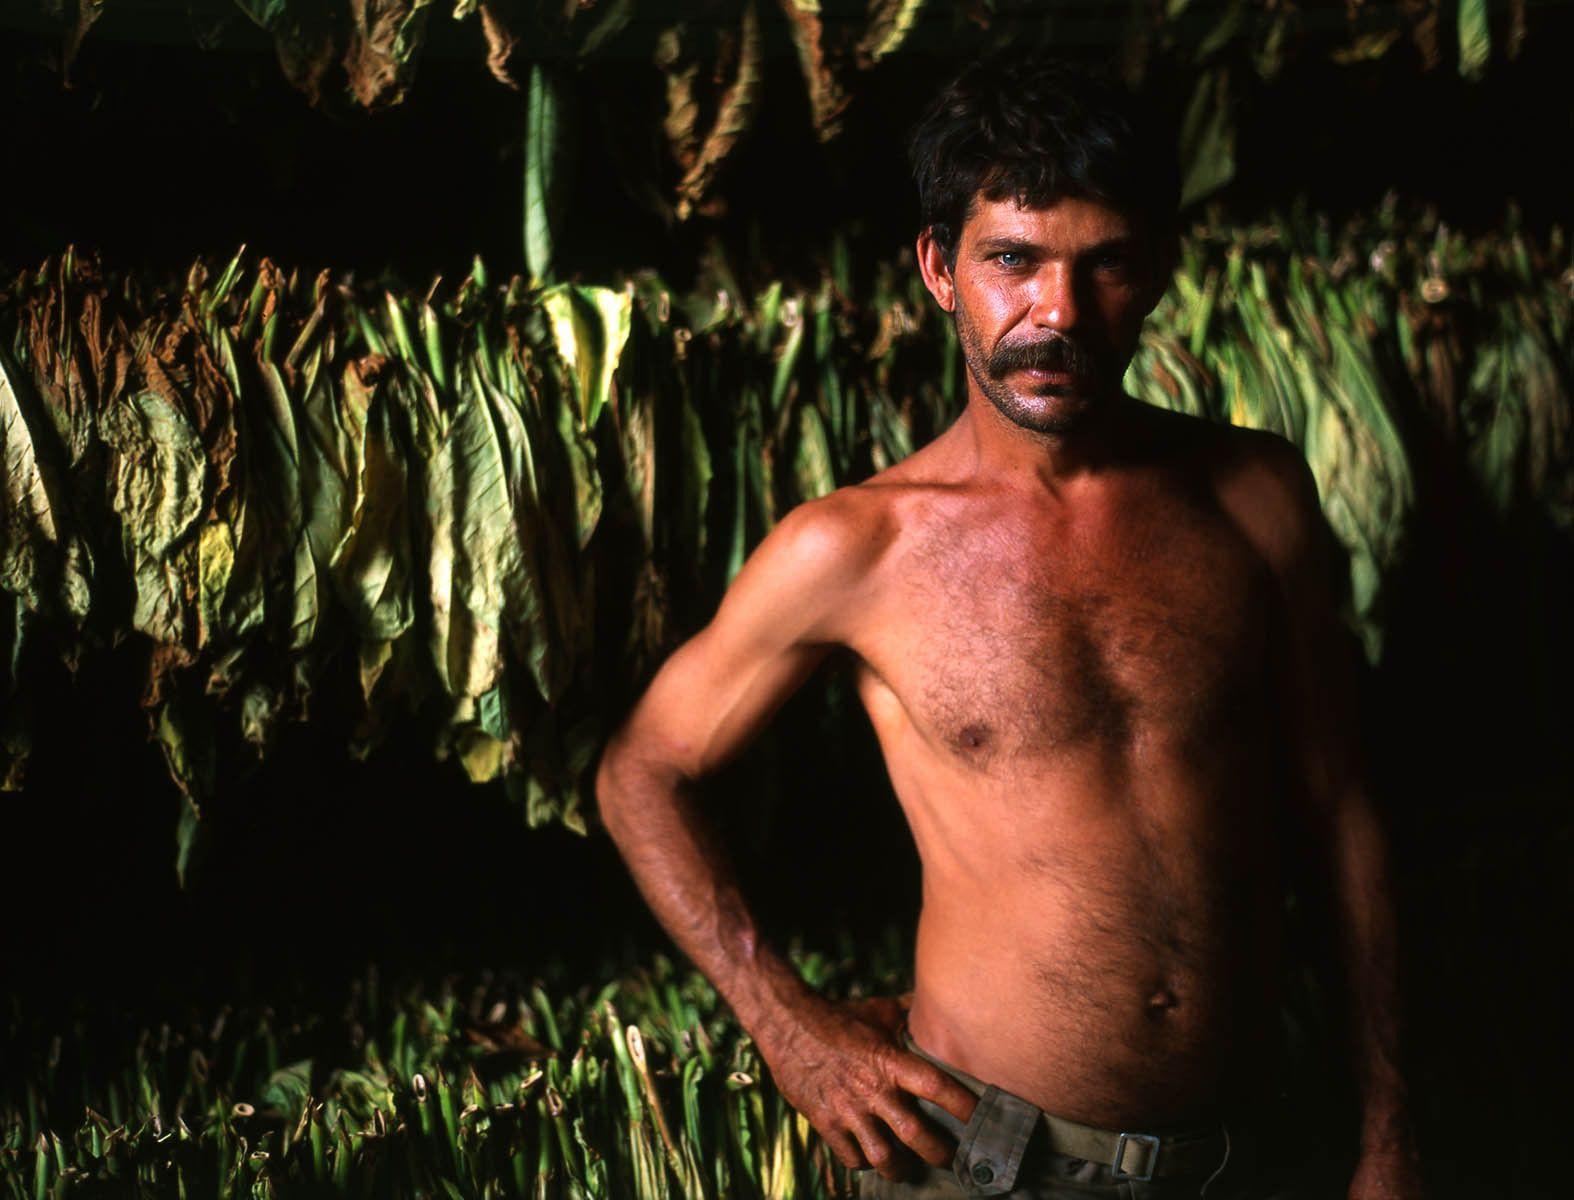 Raul, Tobacco Farmer, Vinales, Cuba